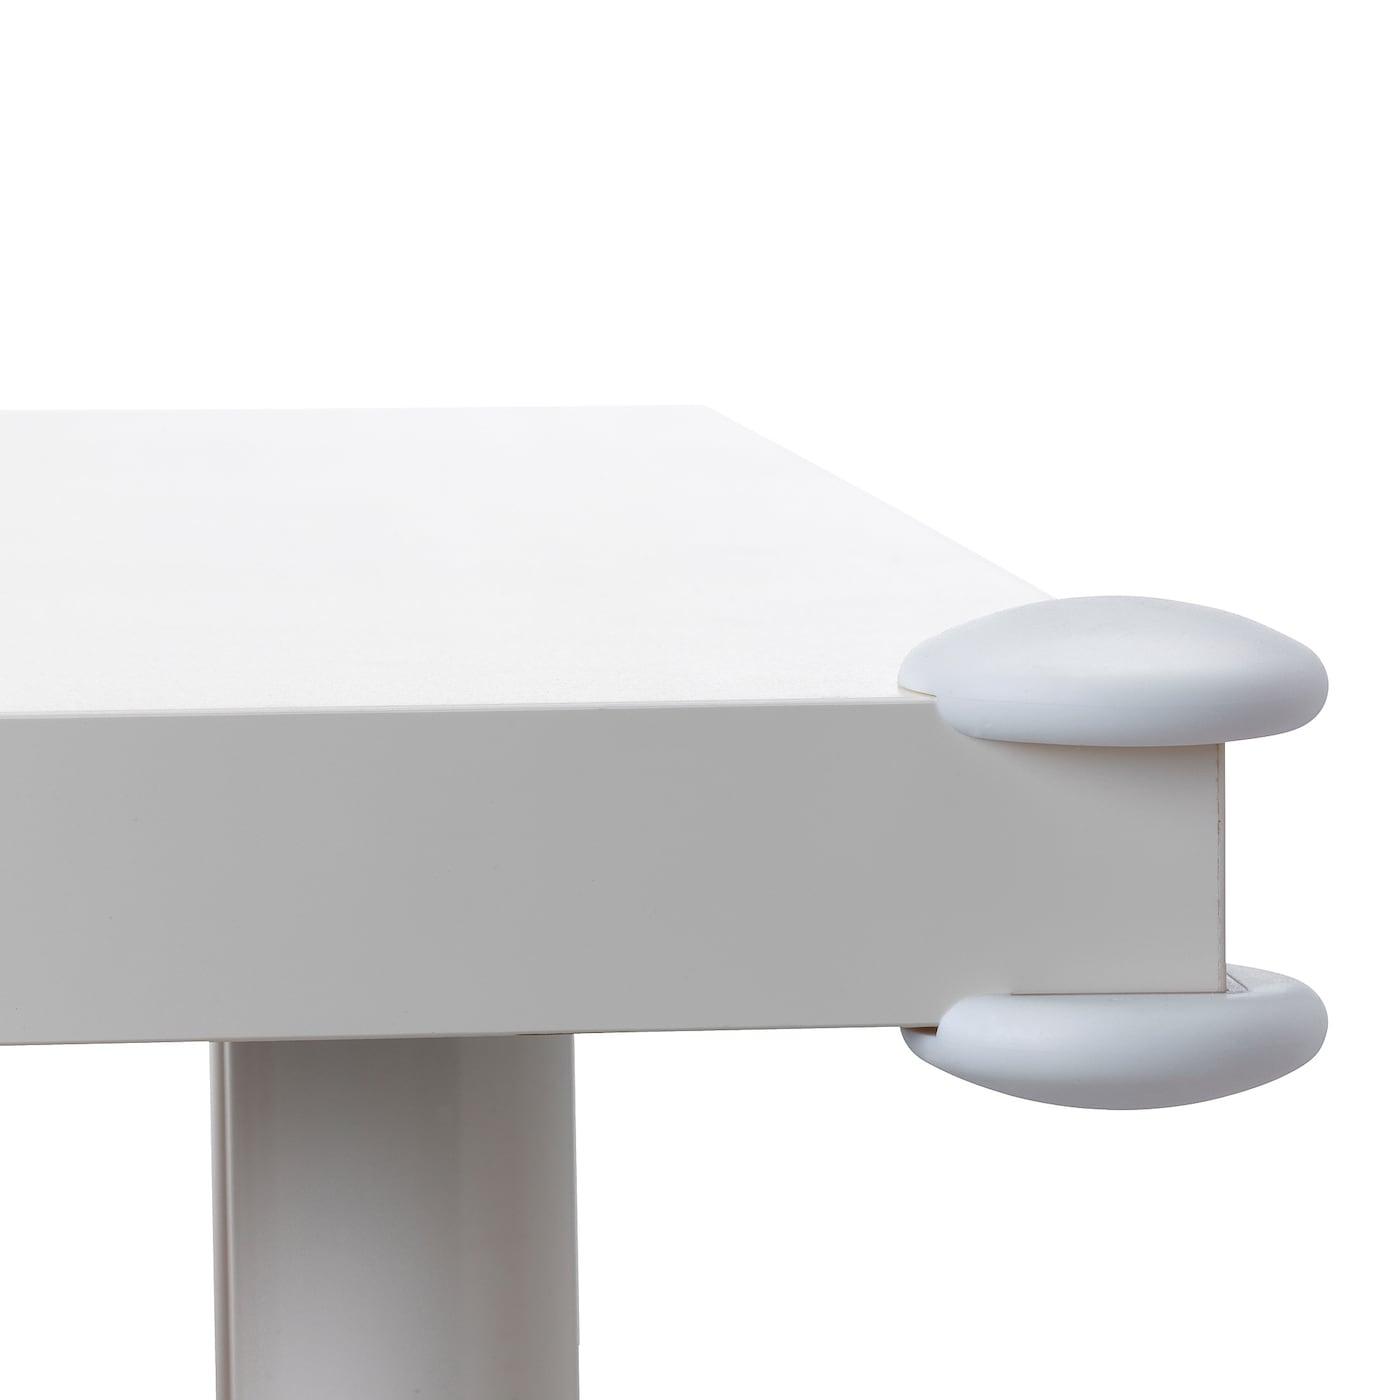 NEW IKEA 8 PACK PATRULL WHITE CHILD-SAFE TABLE CORNER BUMPER